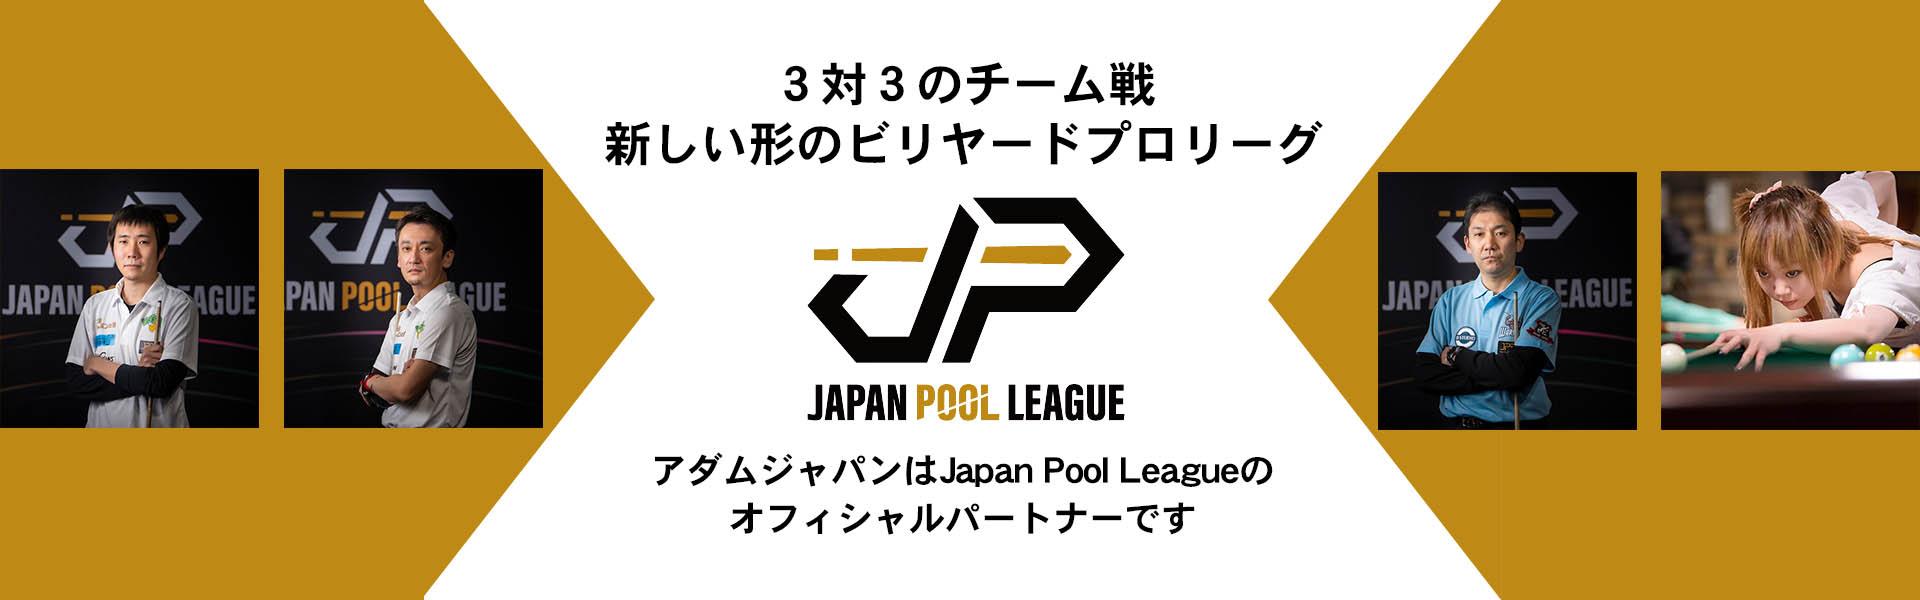 Japan Pool League